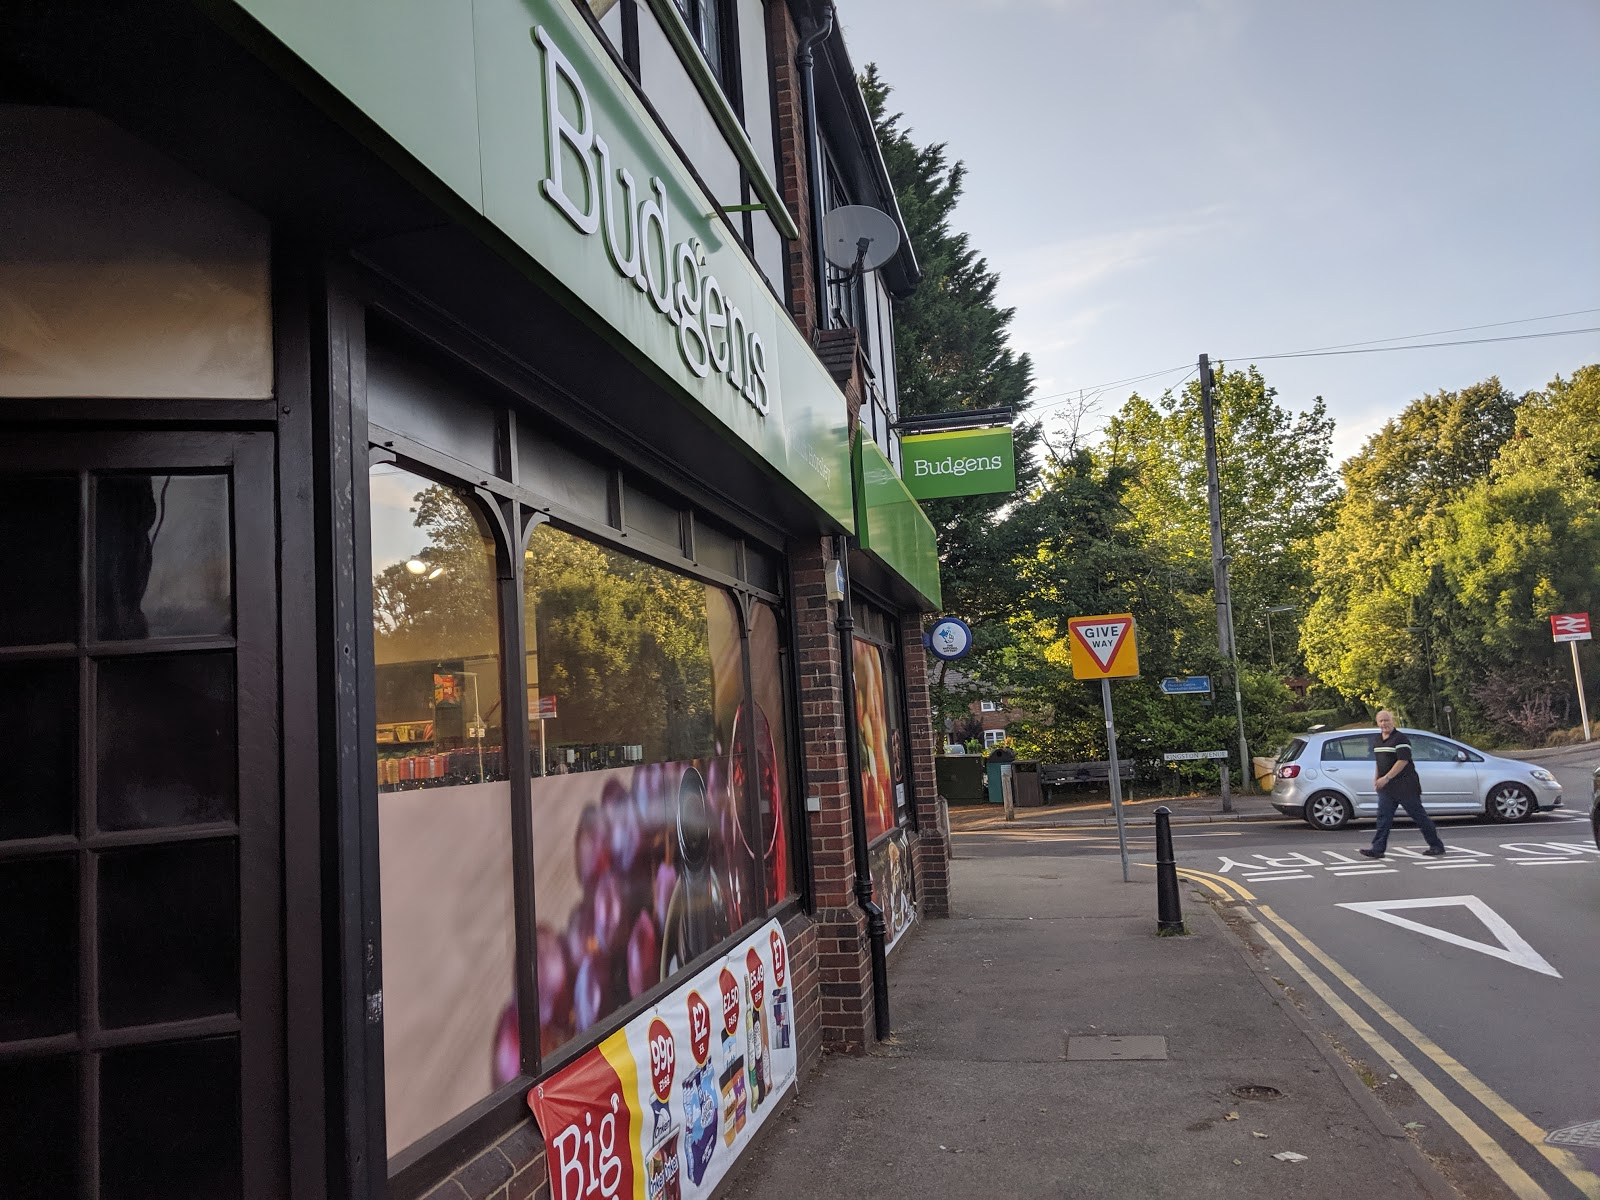 Ready Camp Horsley Review : Glamping near LEGOLAND and Chessington World of Adventures - Budgens supermarket East Horsley